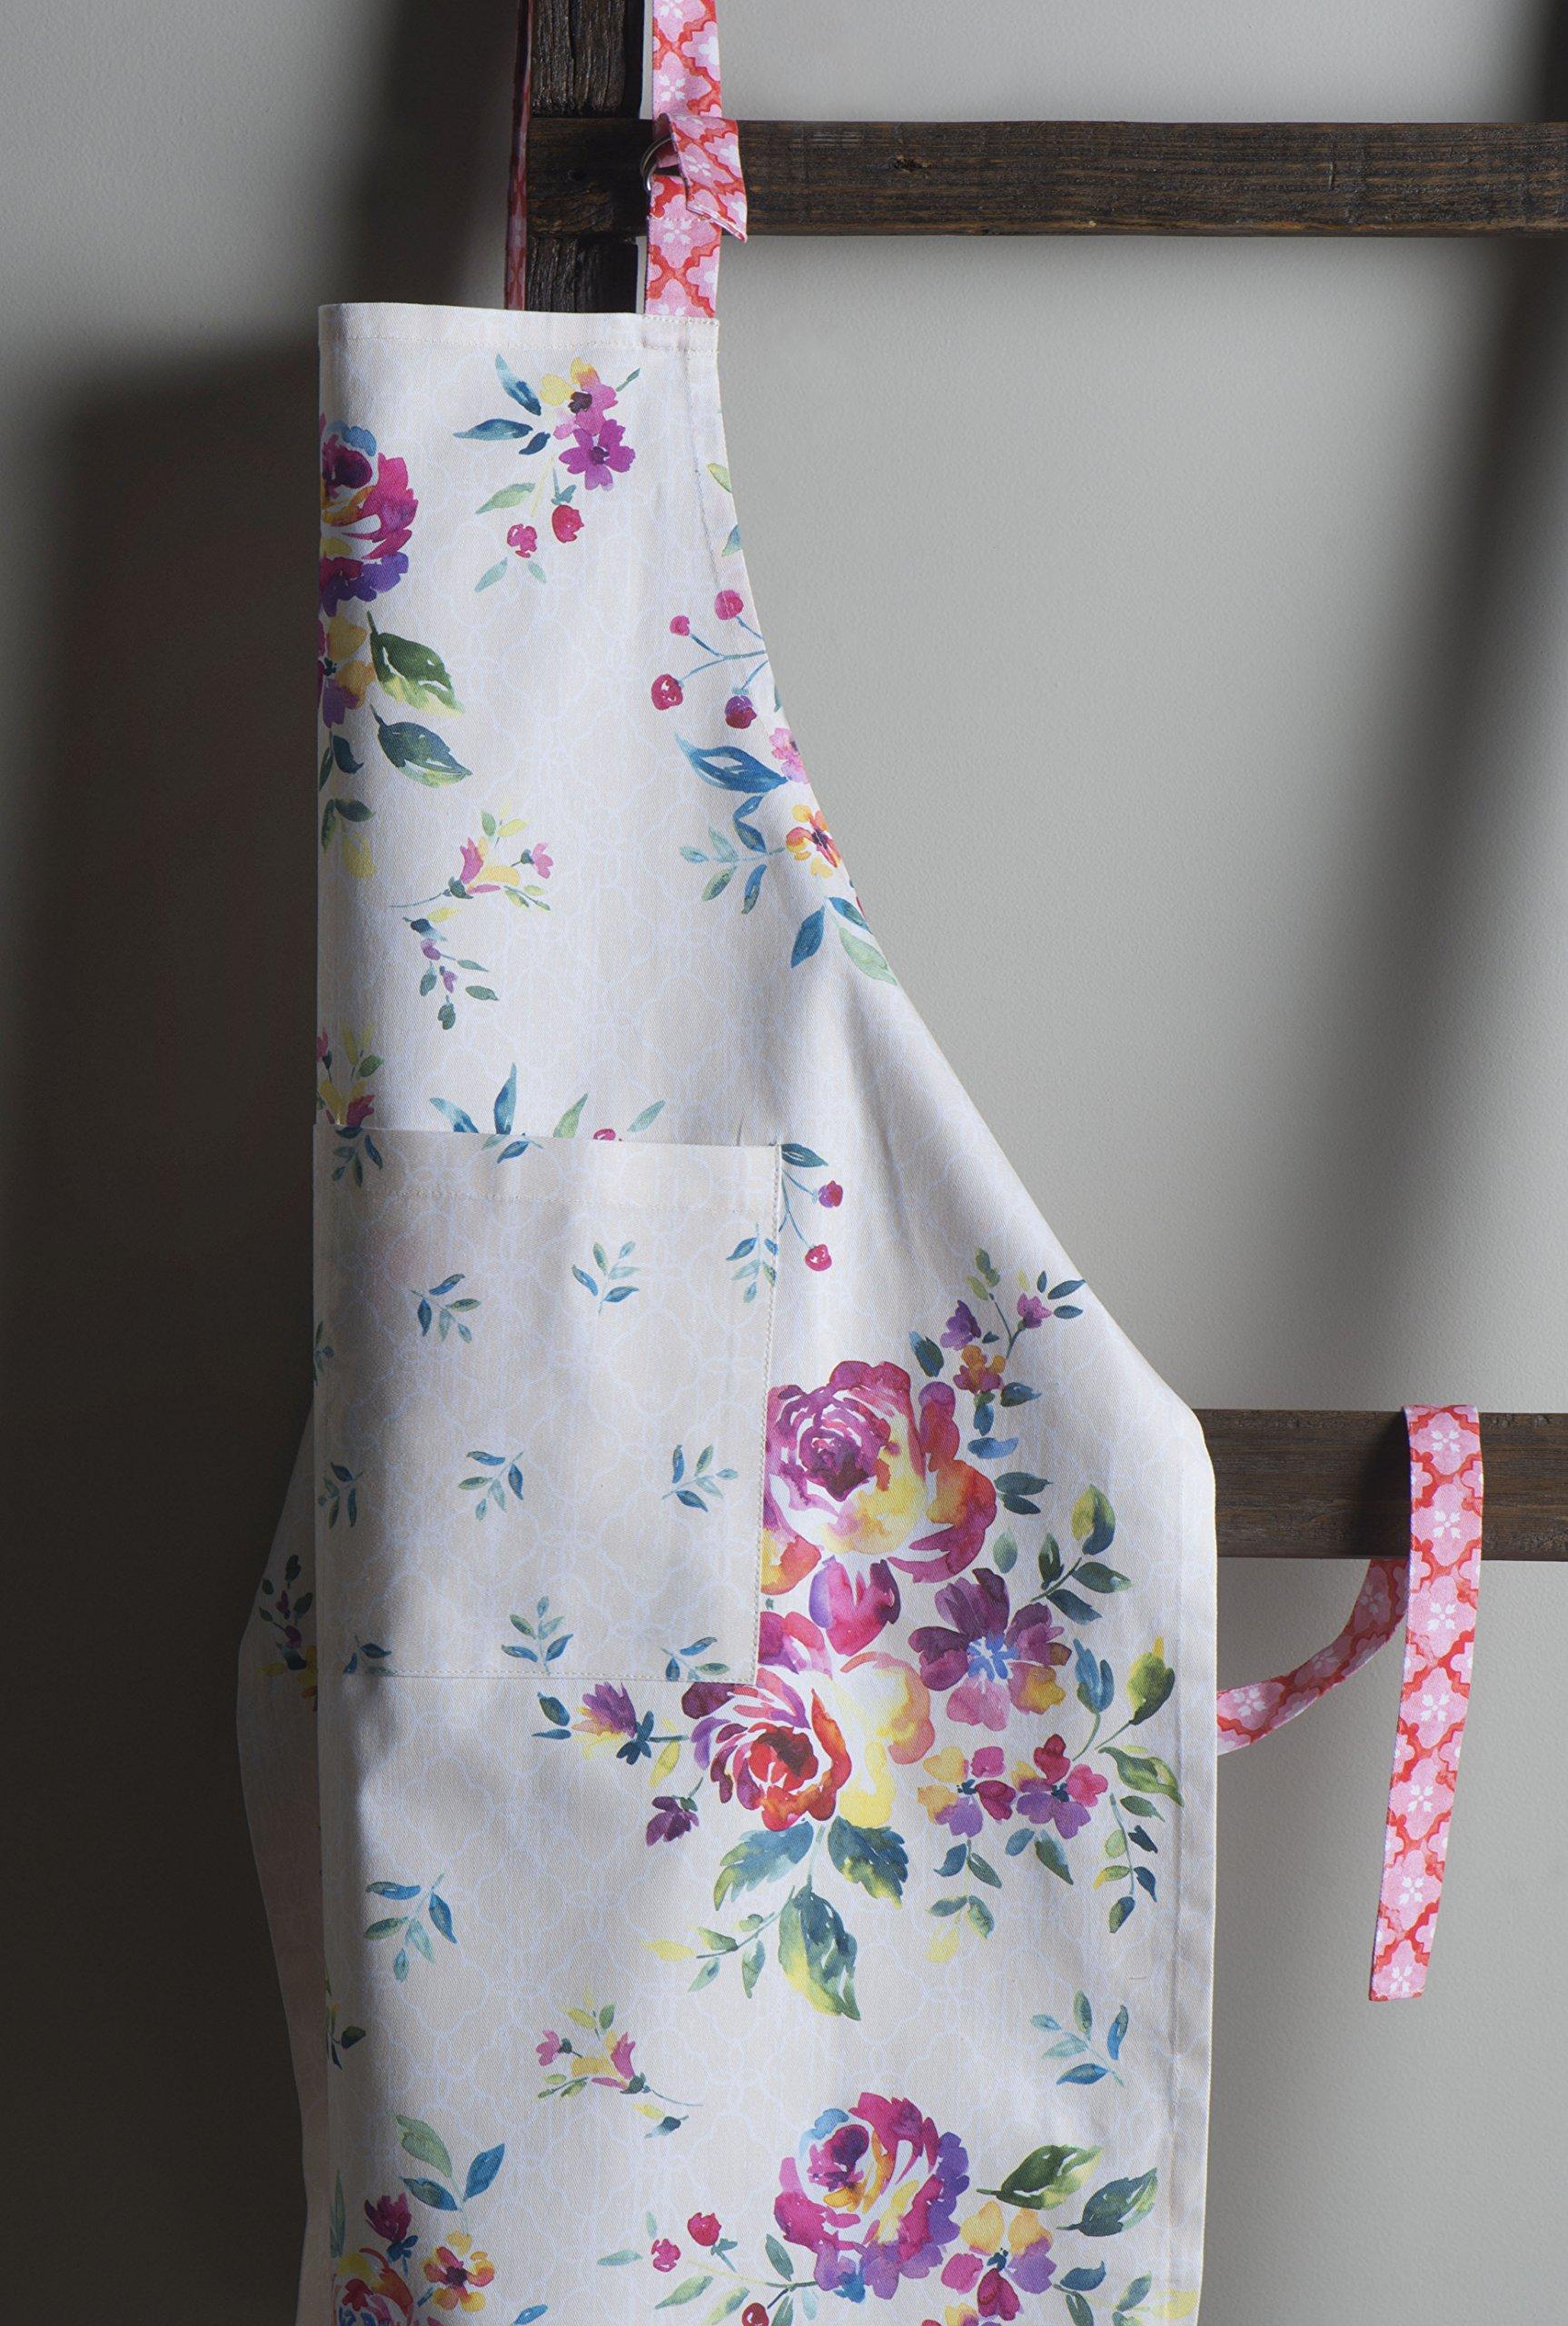 Maison d' Hermine Rose Garden 100% Cotton Apron with an adjustable neck & Visible center pocket 27.50 Inch by 31.50 Inch by Maison d' Hermine (Image #2)